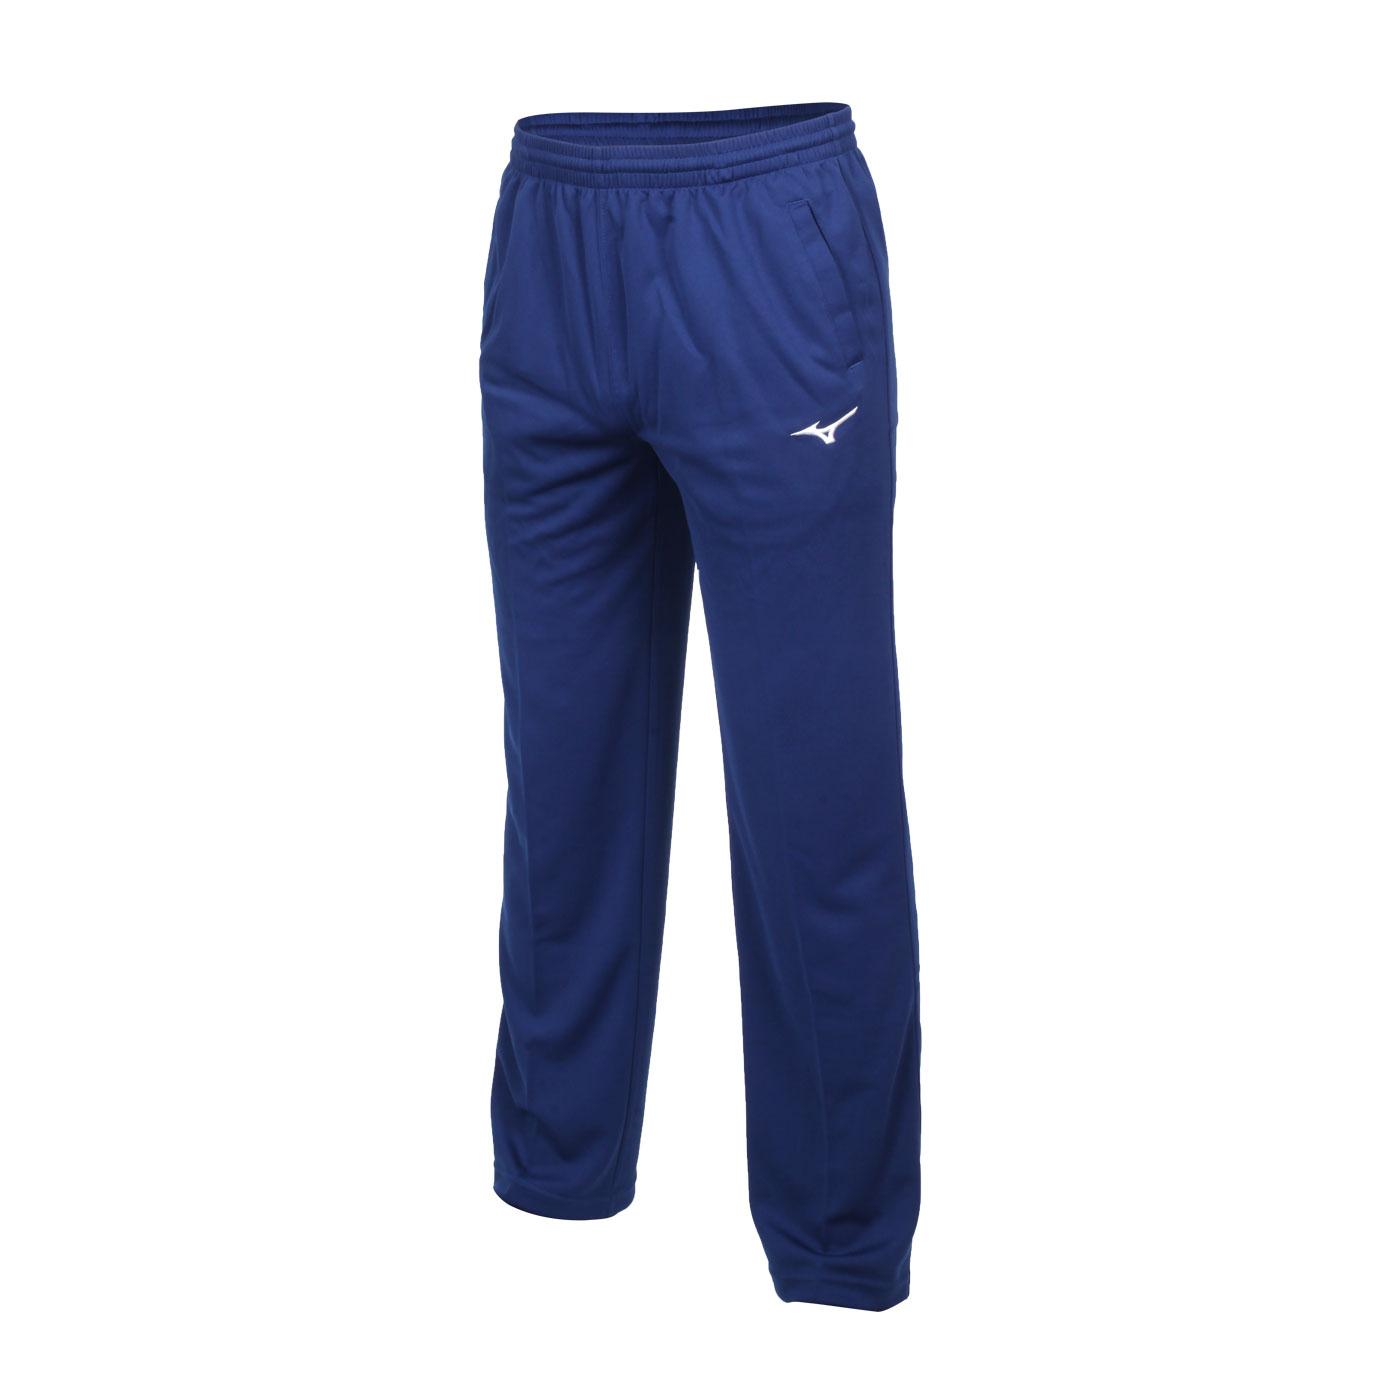 MIZUNO 男款針織長褲 32TD8A3816 - 藍白